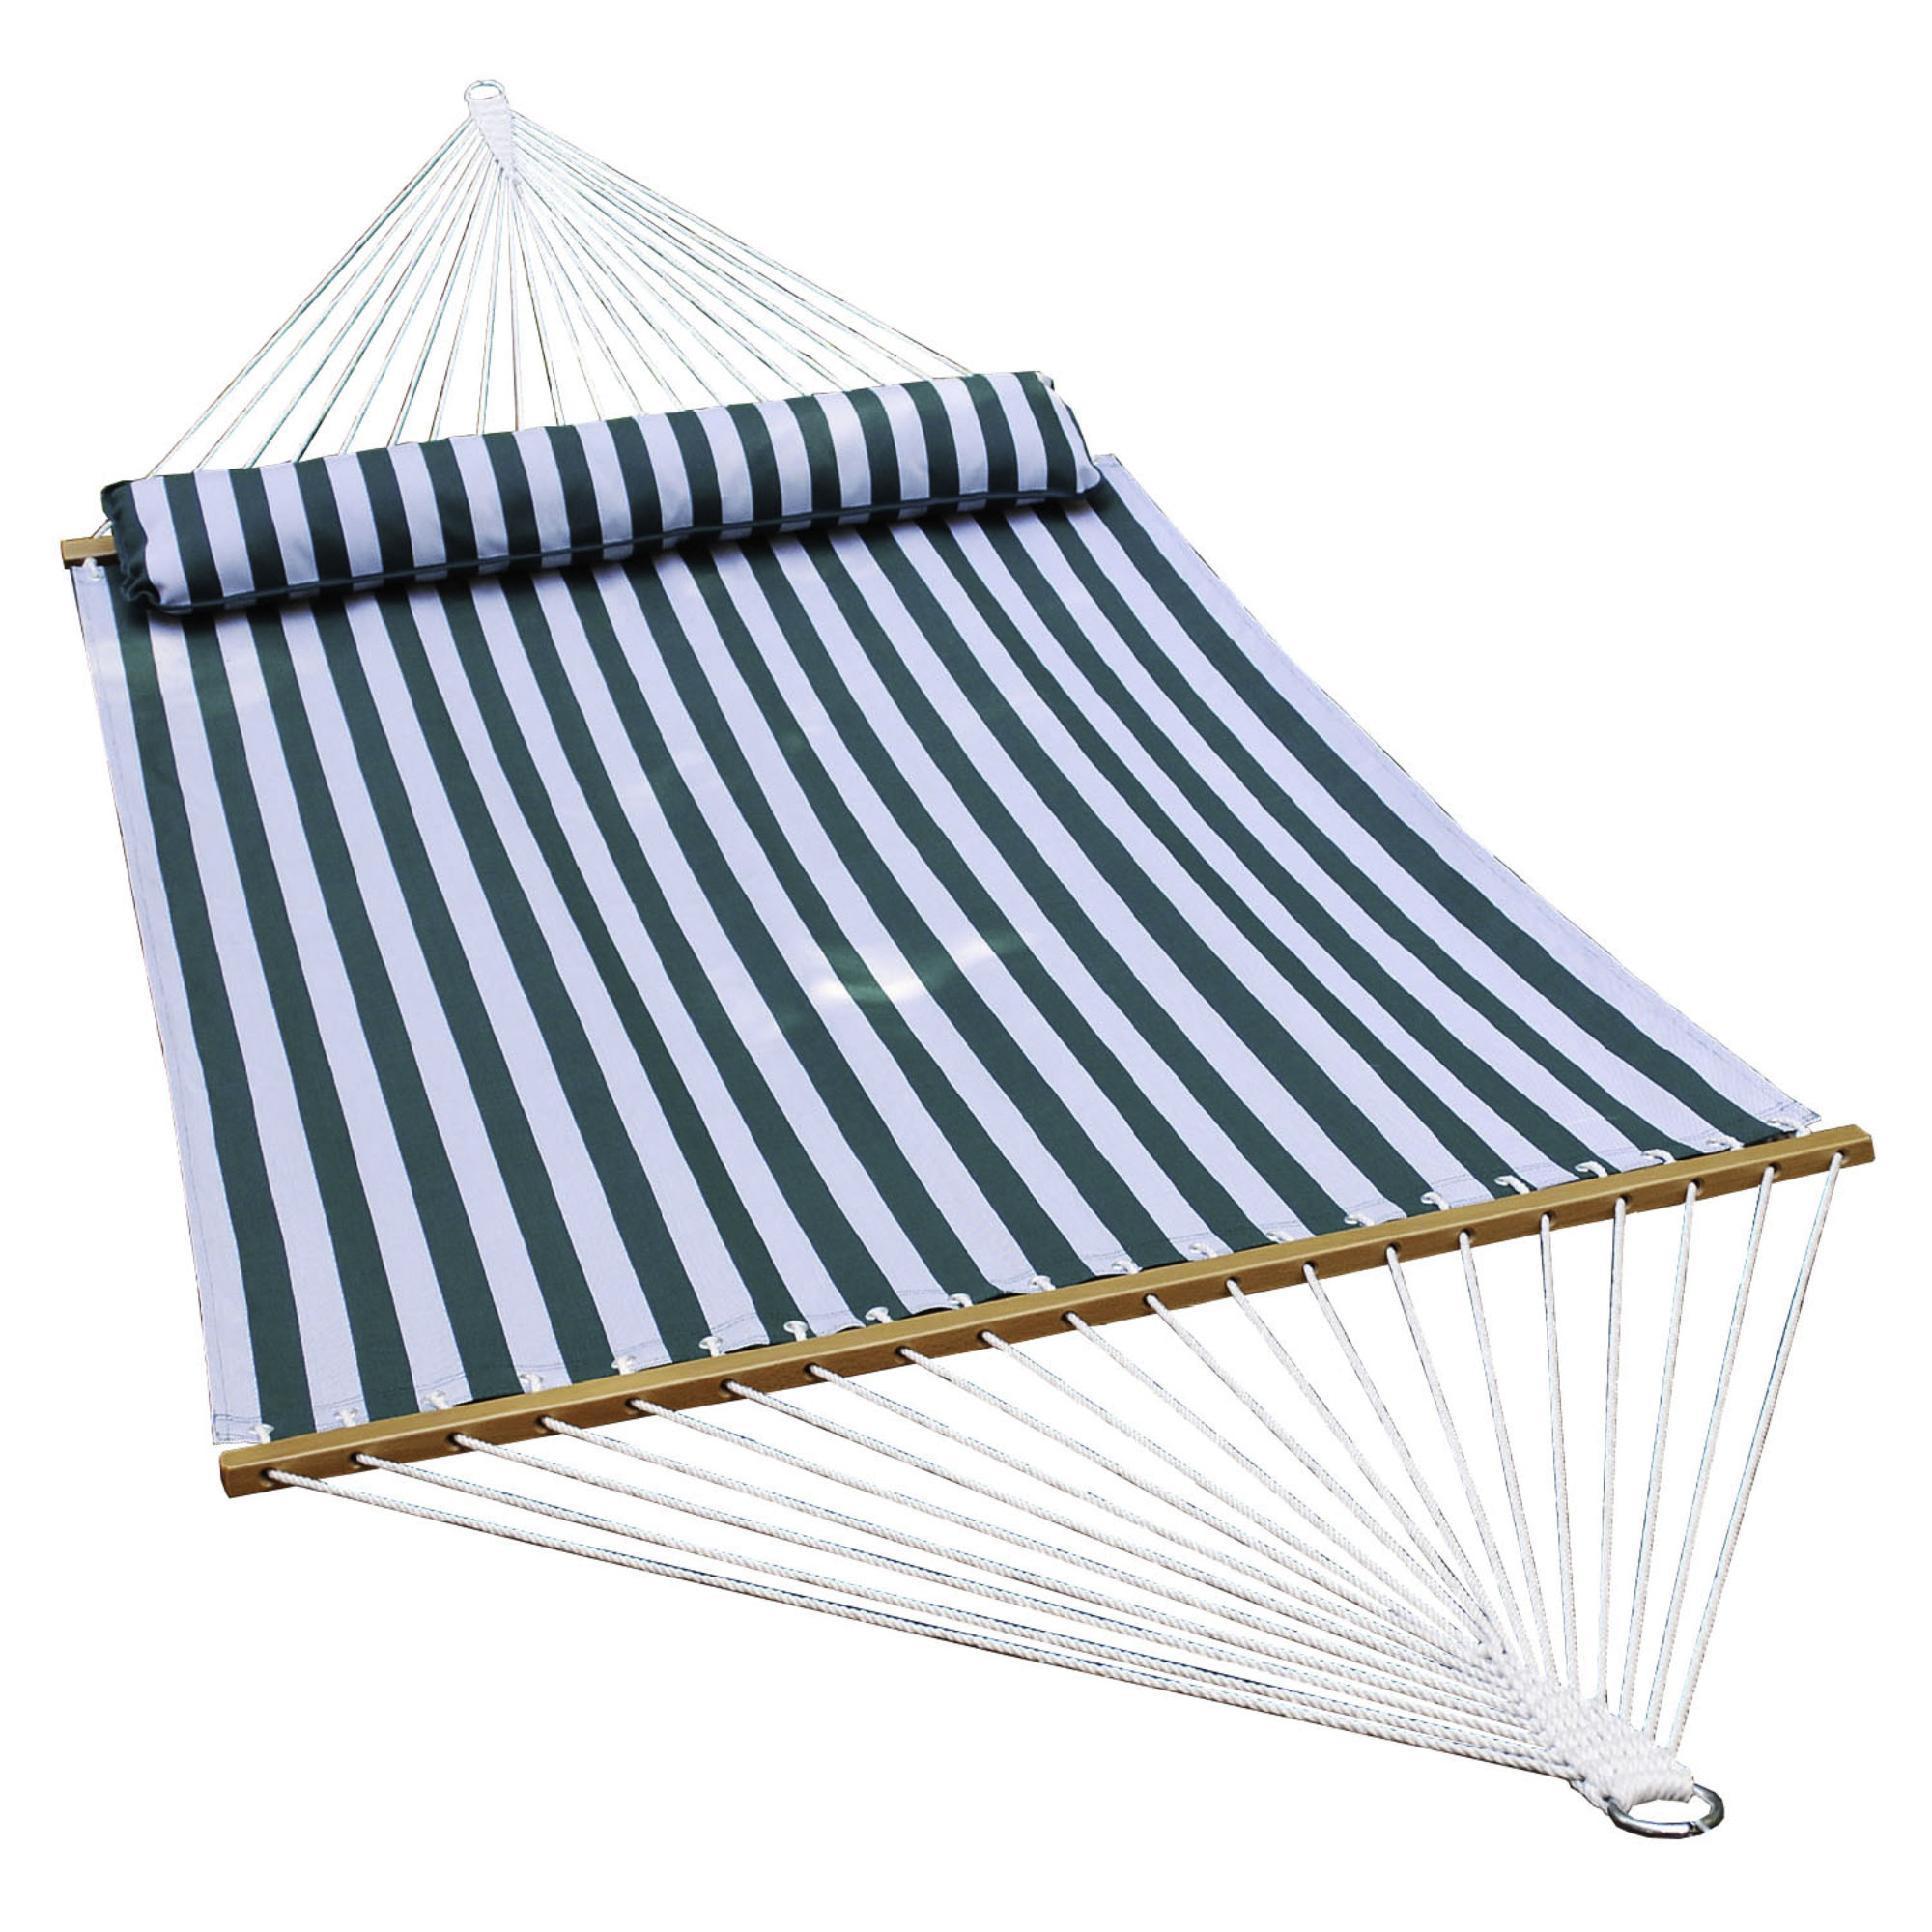 Textilene Hammock - Green/White Stripe